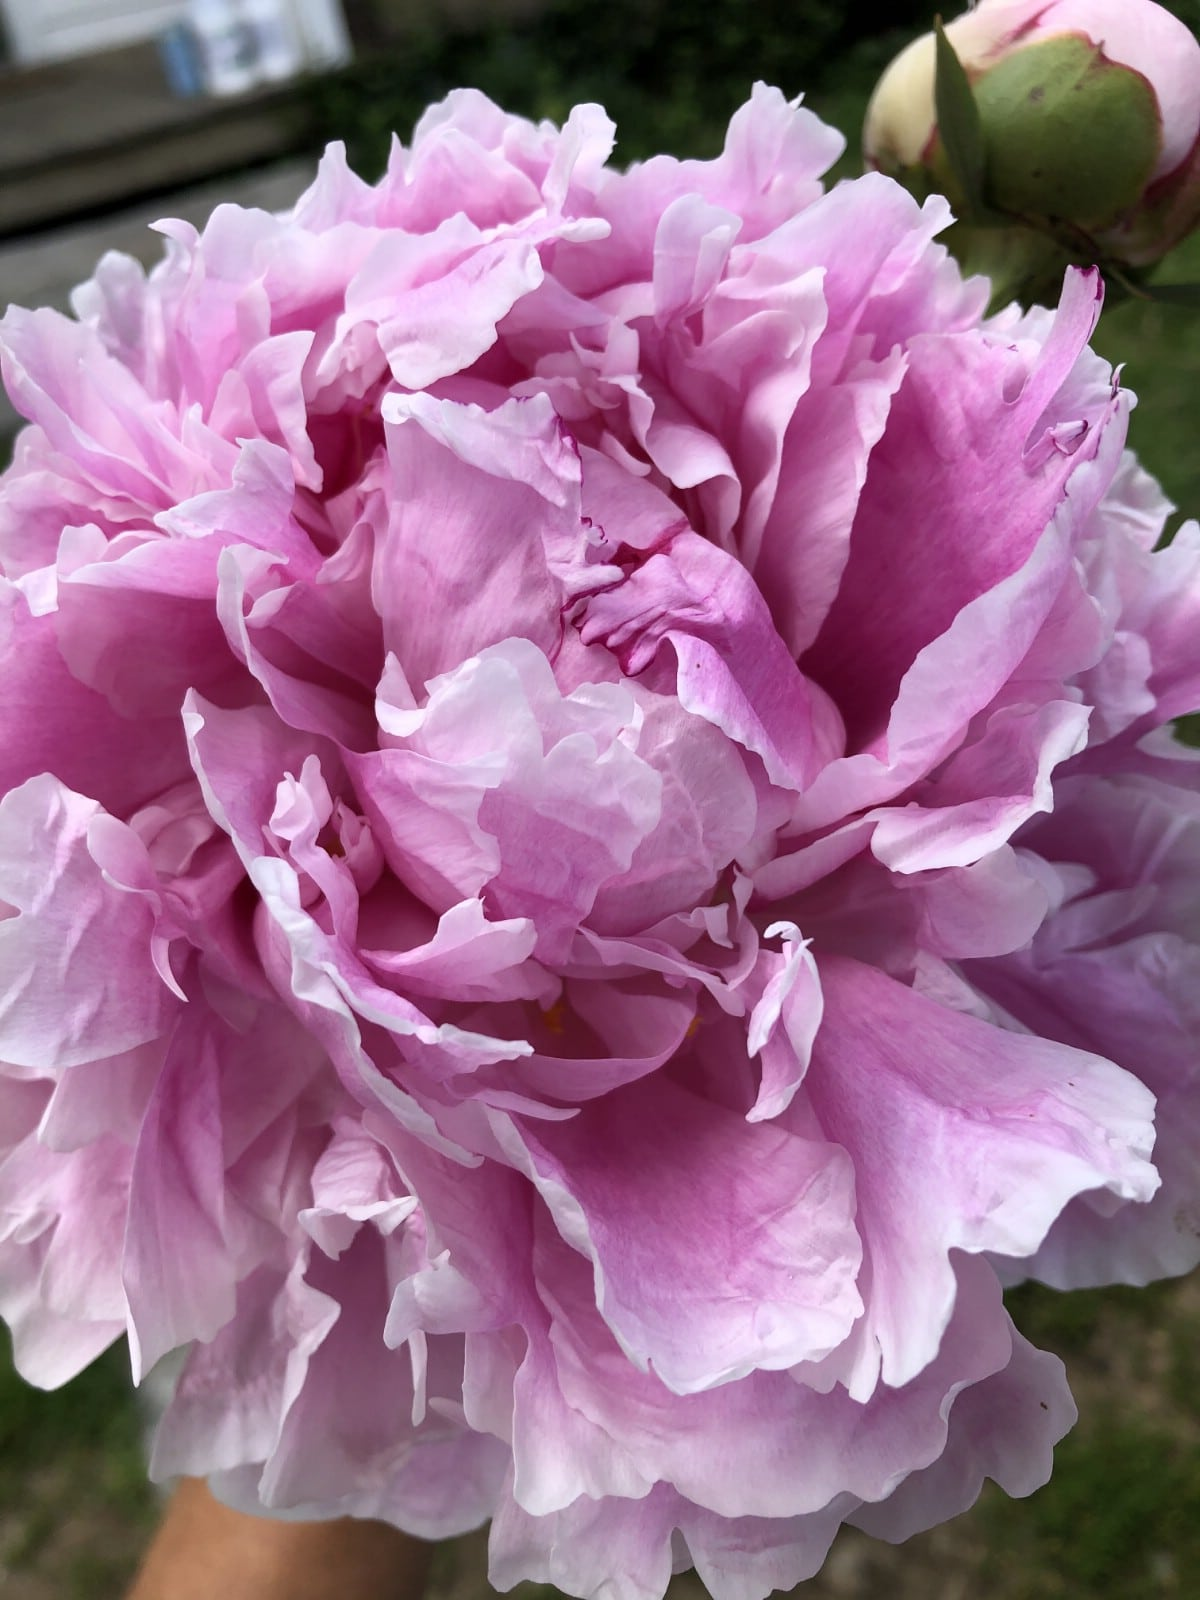 large pink peony flower